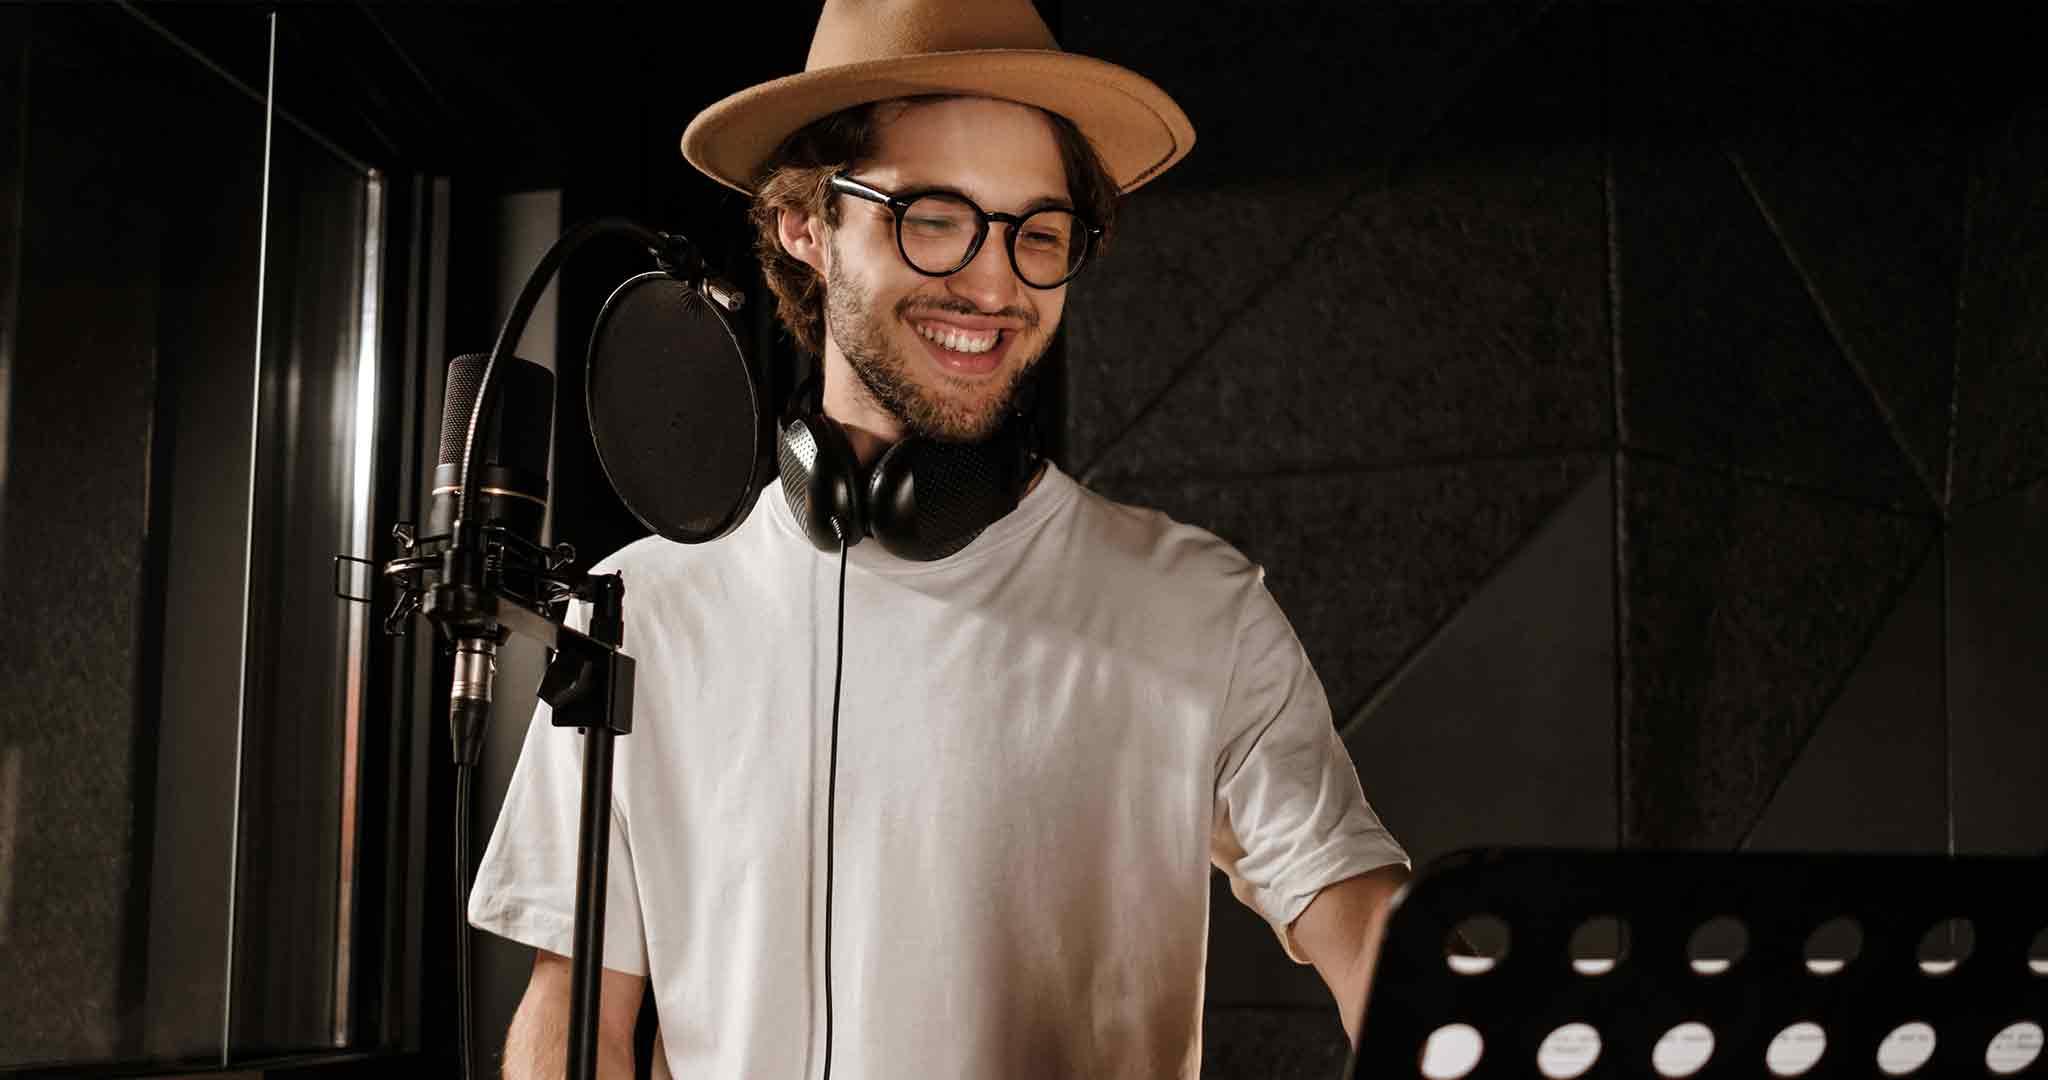 glasgow-recording-studio-singer